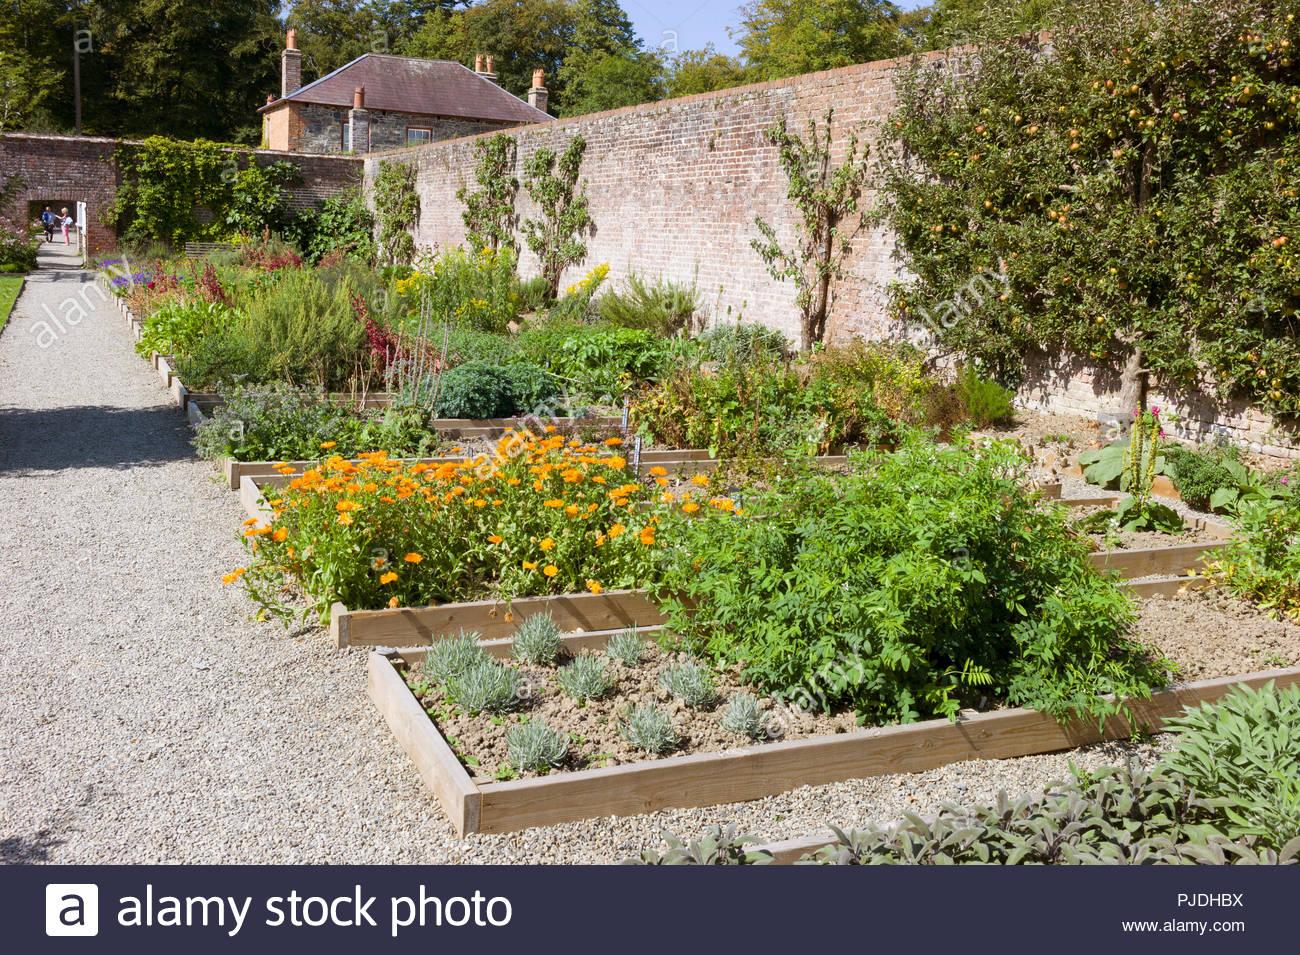 The herb garden borders in the walled kitchen garden at Llanerchaeron villa, Ceredigion, Wales, UK Stock Photo